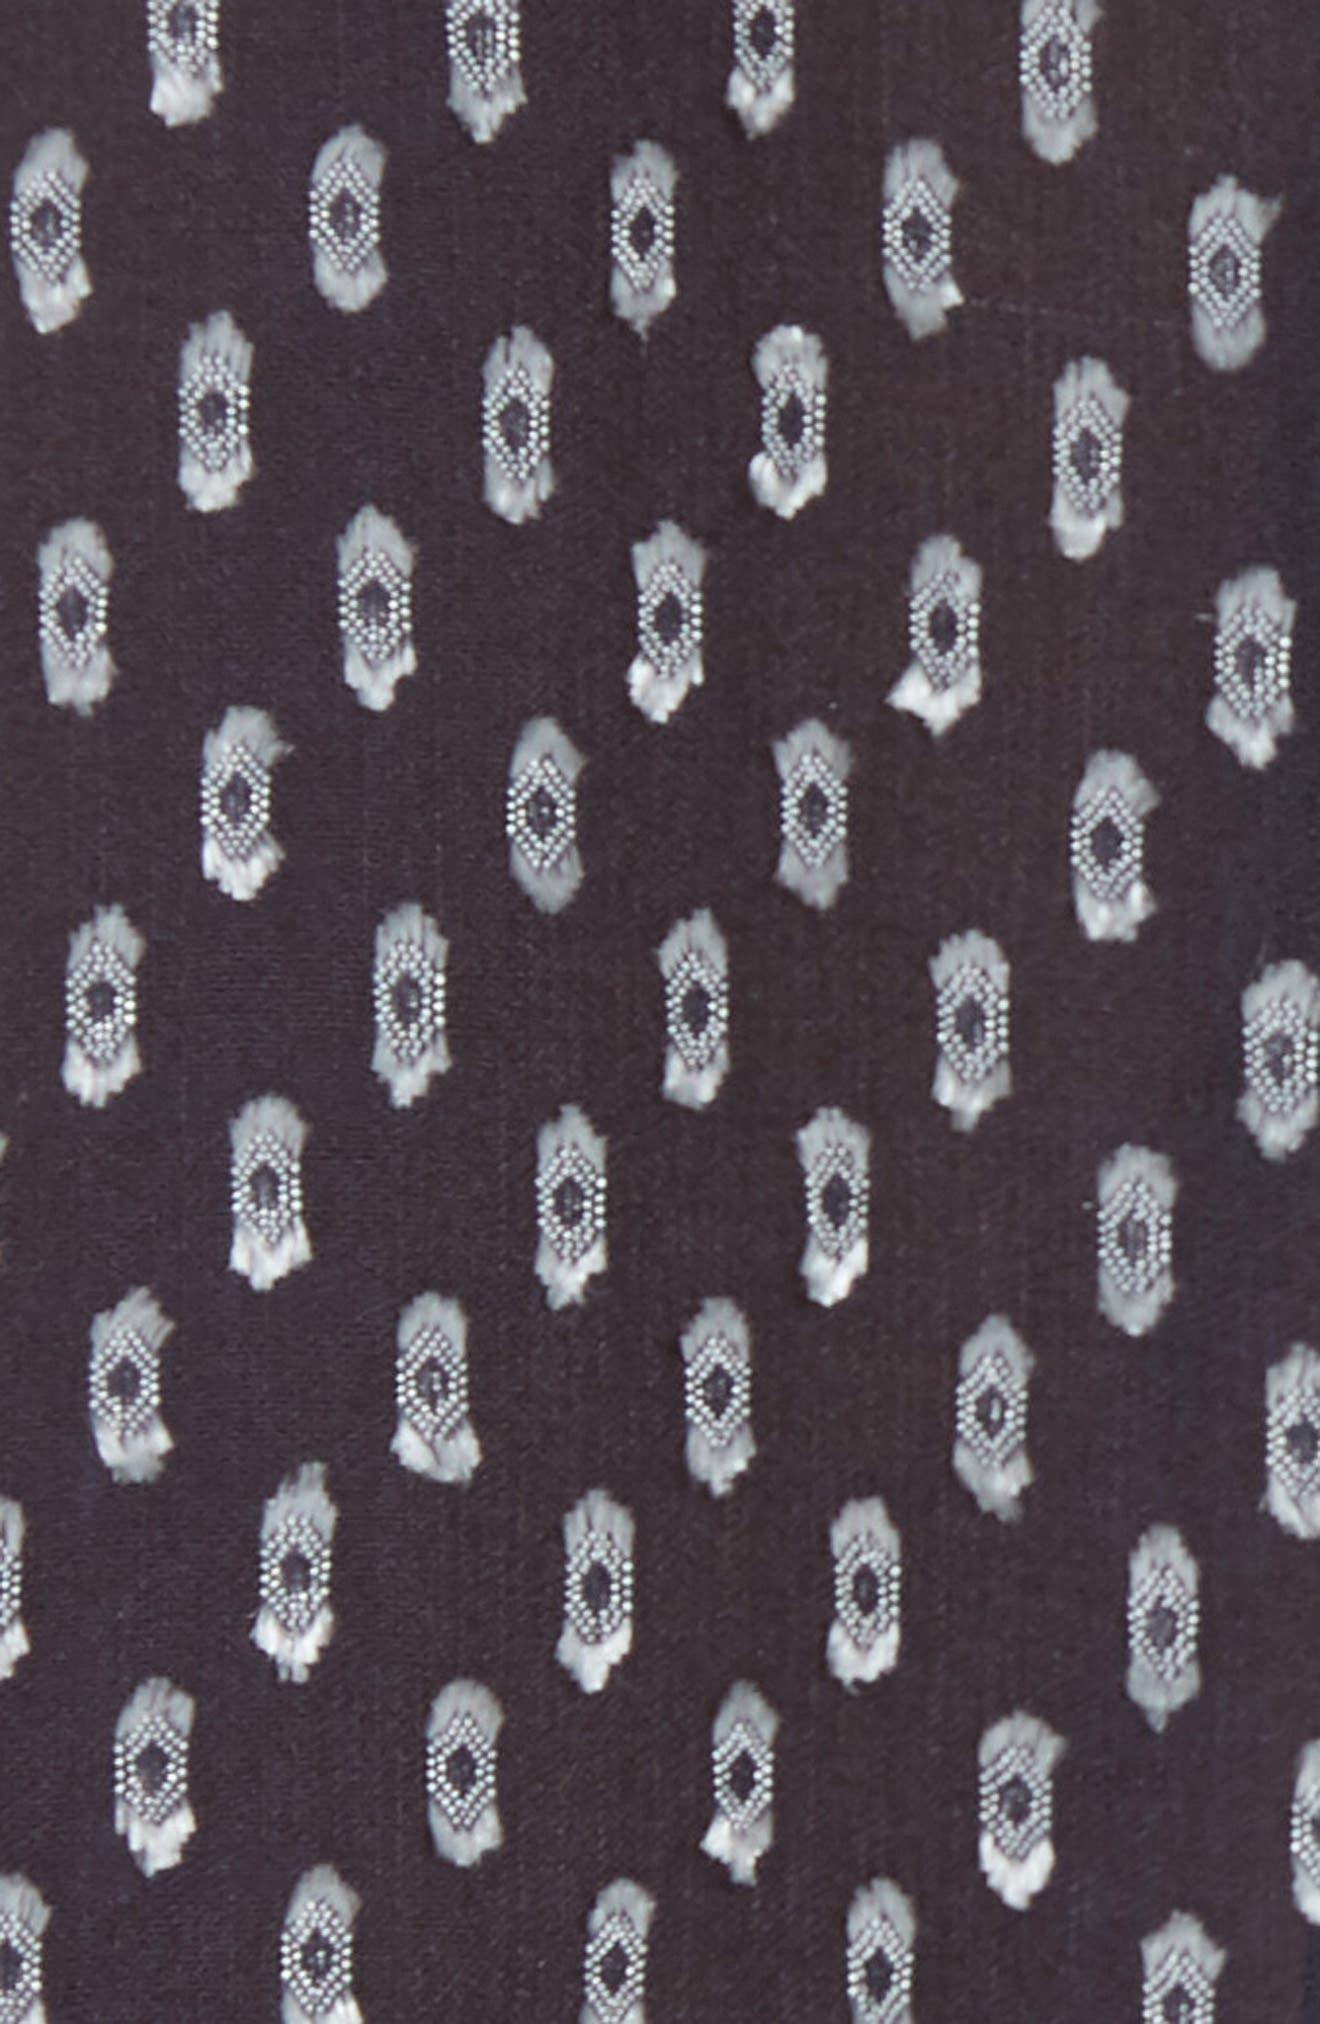 Silk Blend Ruffle Cuff Top,                             Alternate thumbnail 5, color,                             497